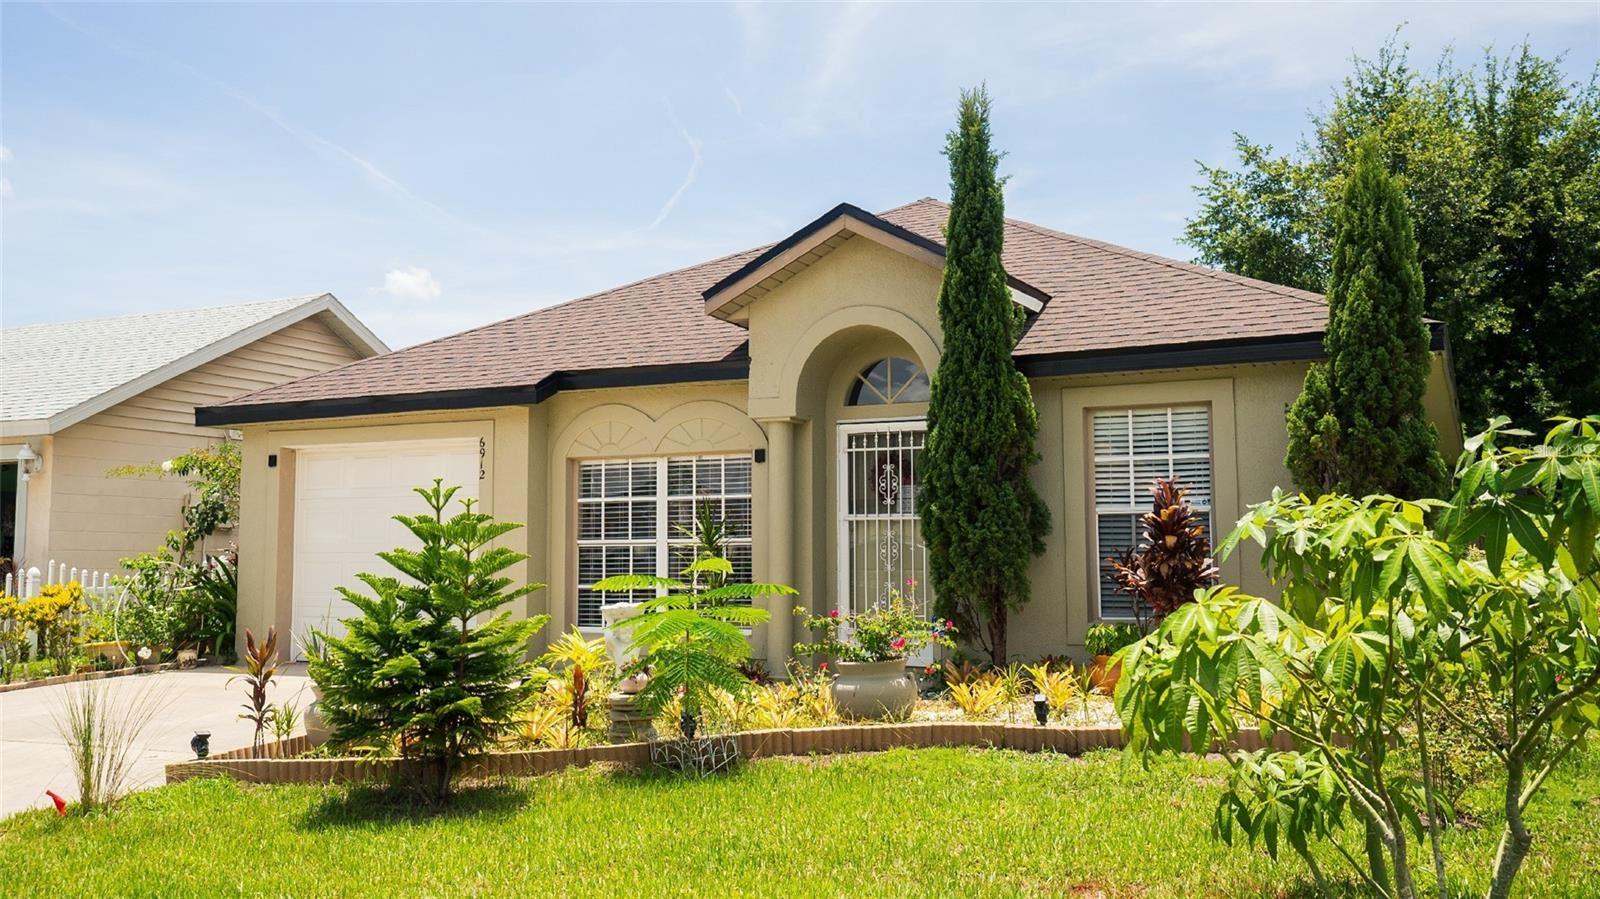 6912 LONG NEEDLE COURT, Orlando, FL 32822 - MLS#: O5962438